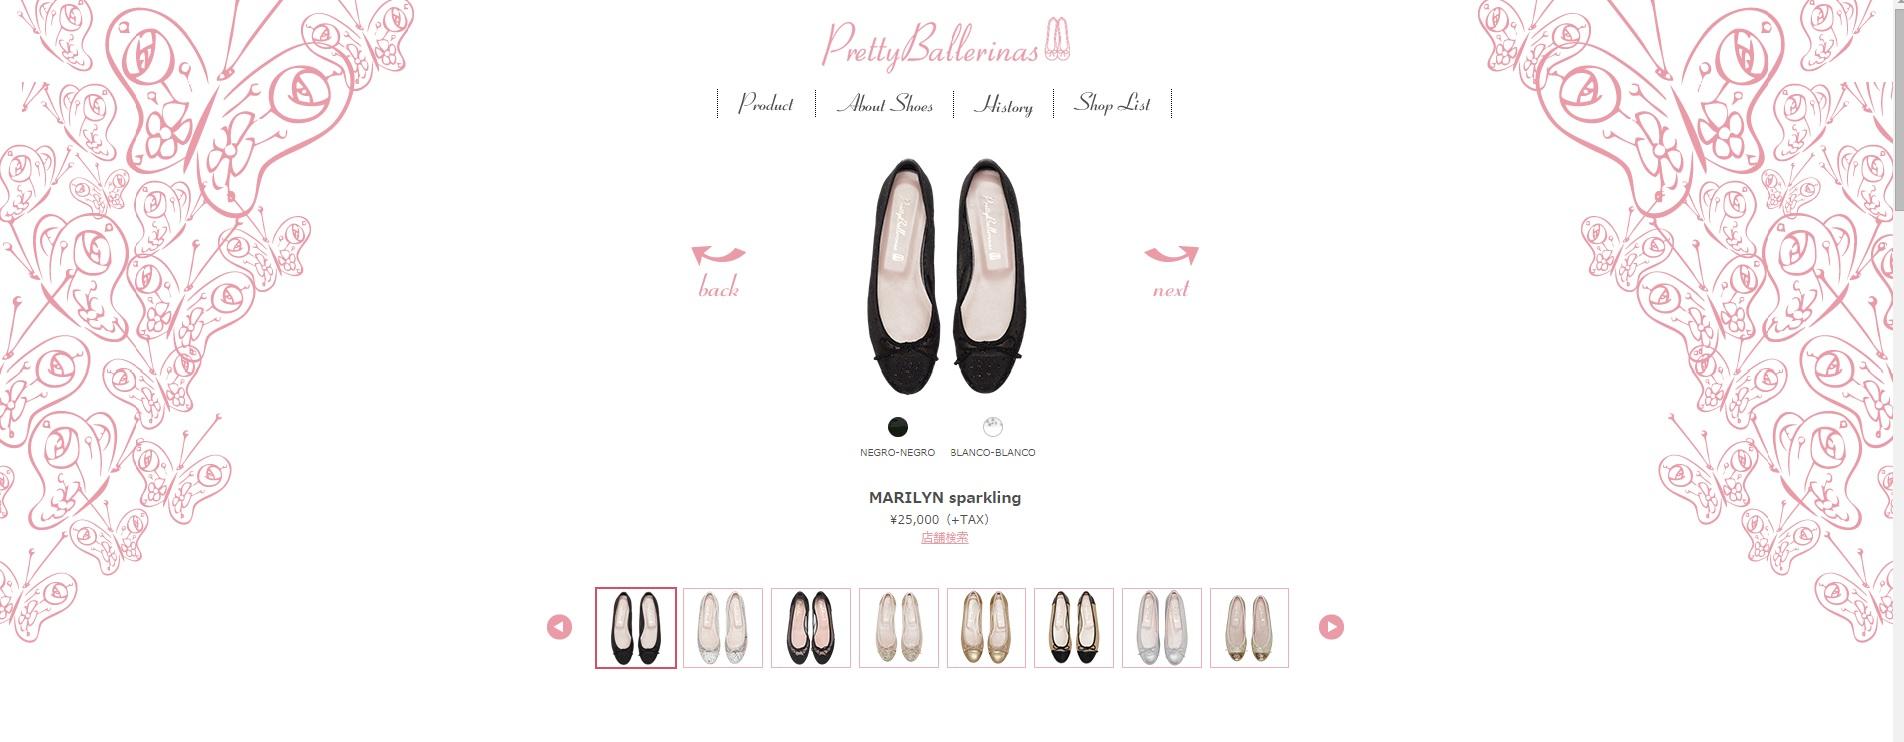 prettyballerinas